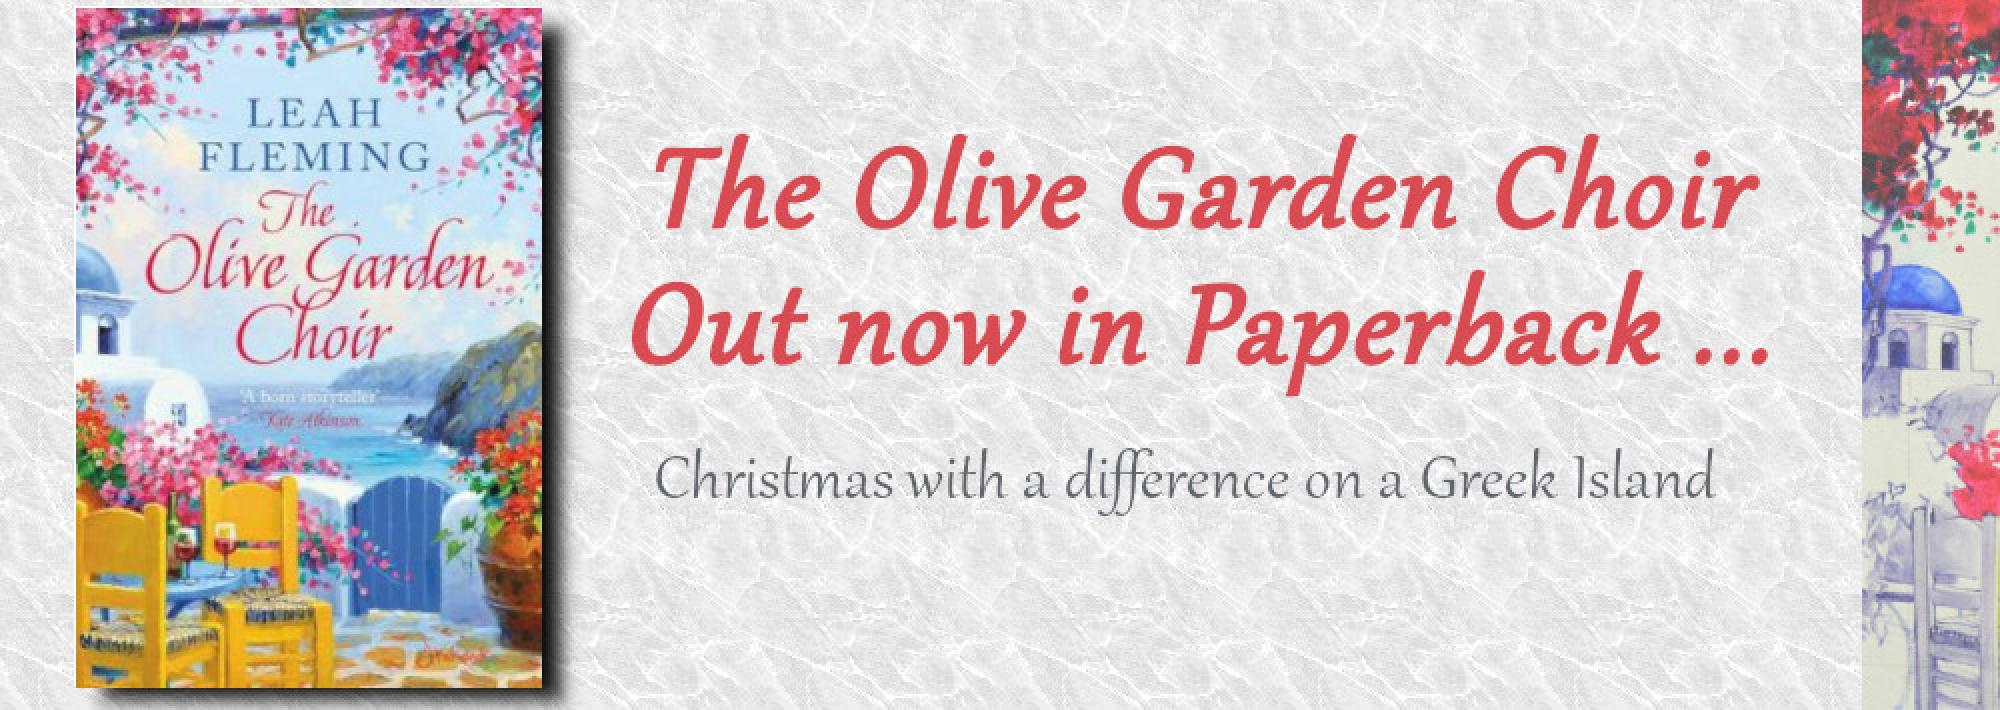 http://www.newsite.leahfleming.co.uk/books/the-olive-garden-choir/